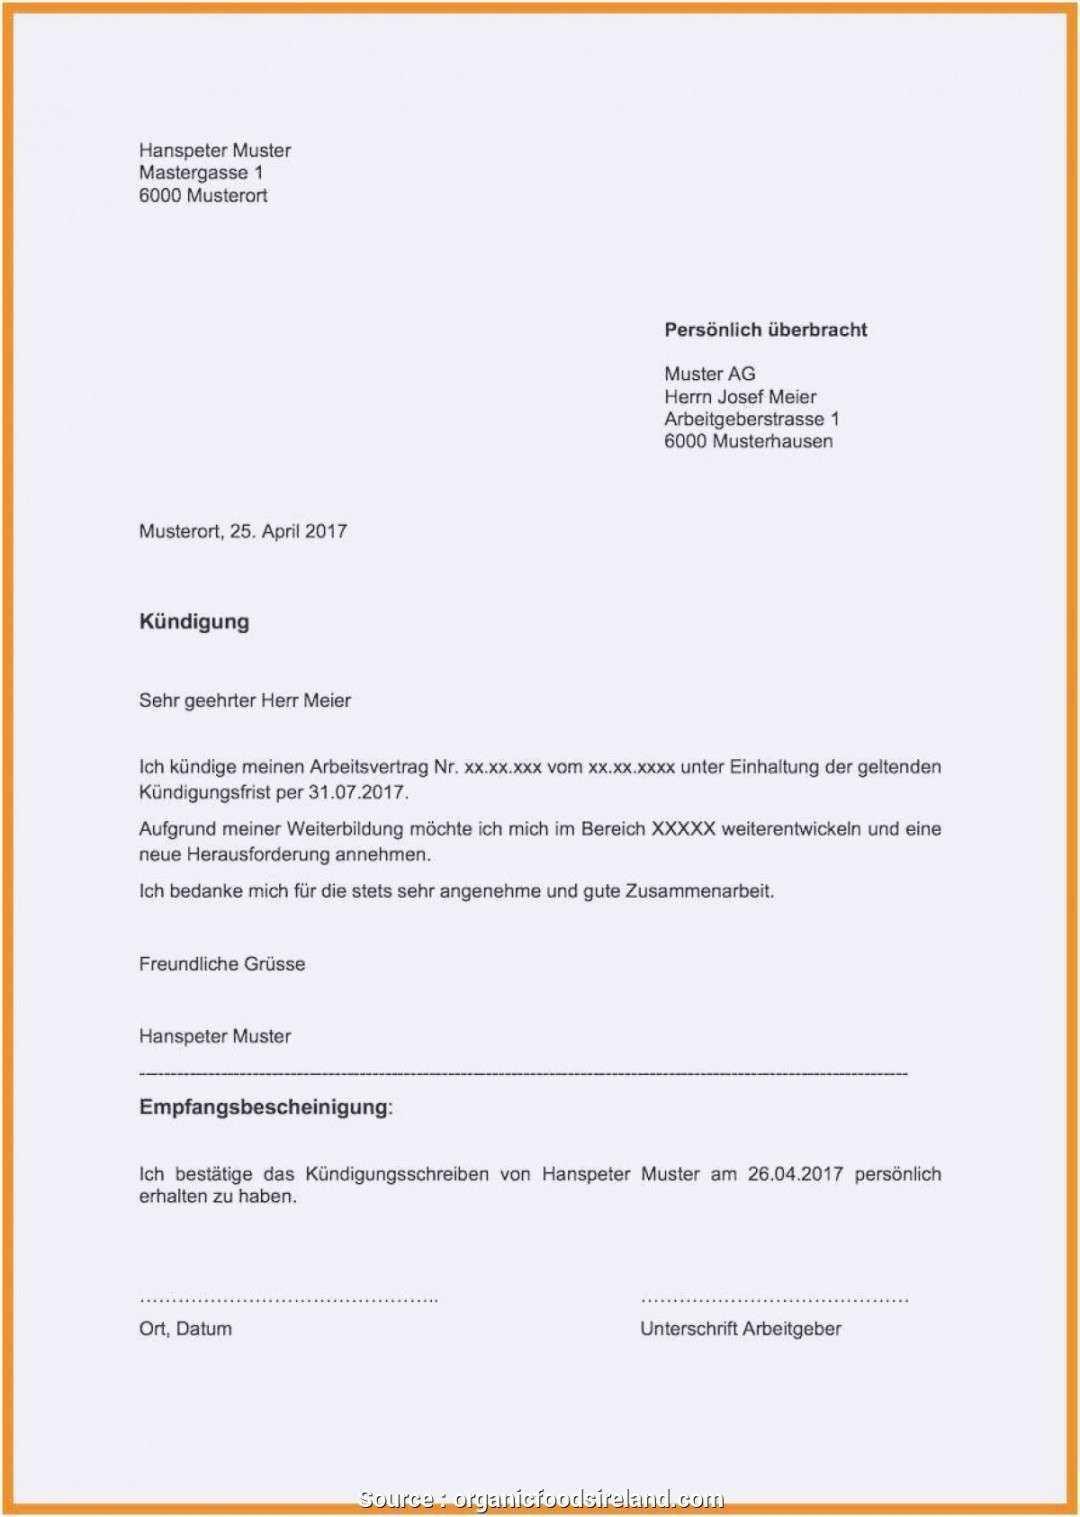 Unterhaltsam Kundigung Mainova Strom Vorlage Vorlagen Word Kundigung Schreiben Vorlagen